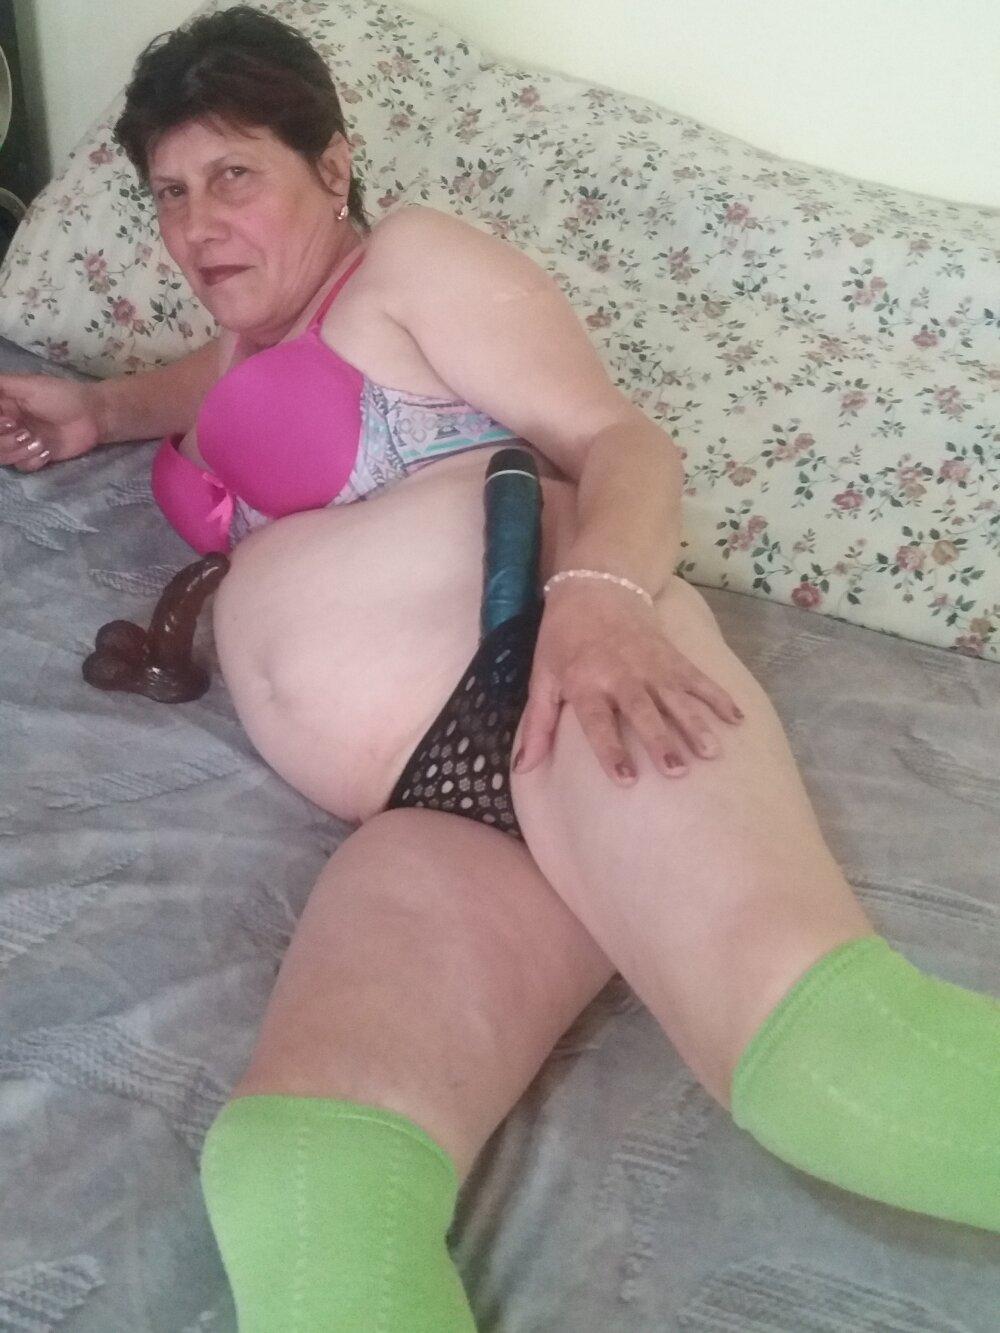 Filthypregnant at StripChat